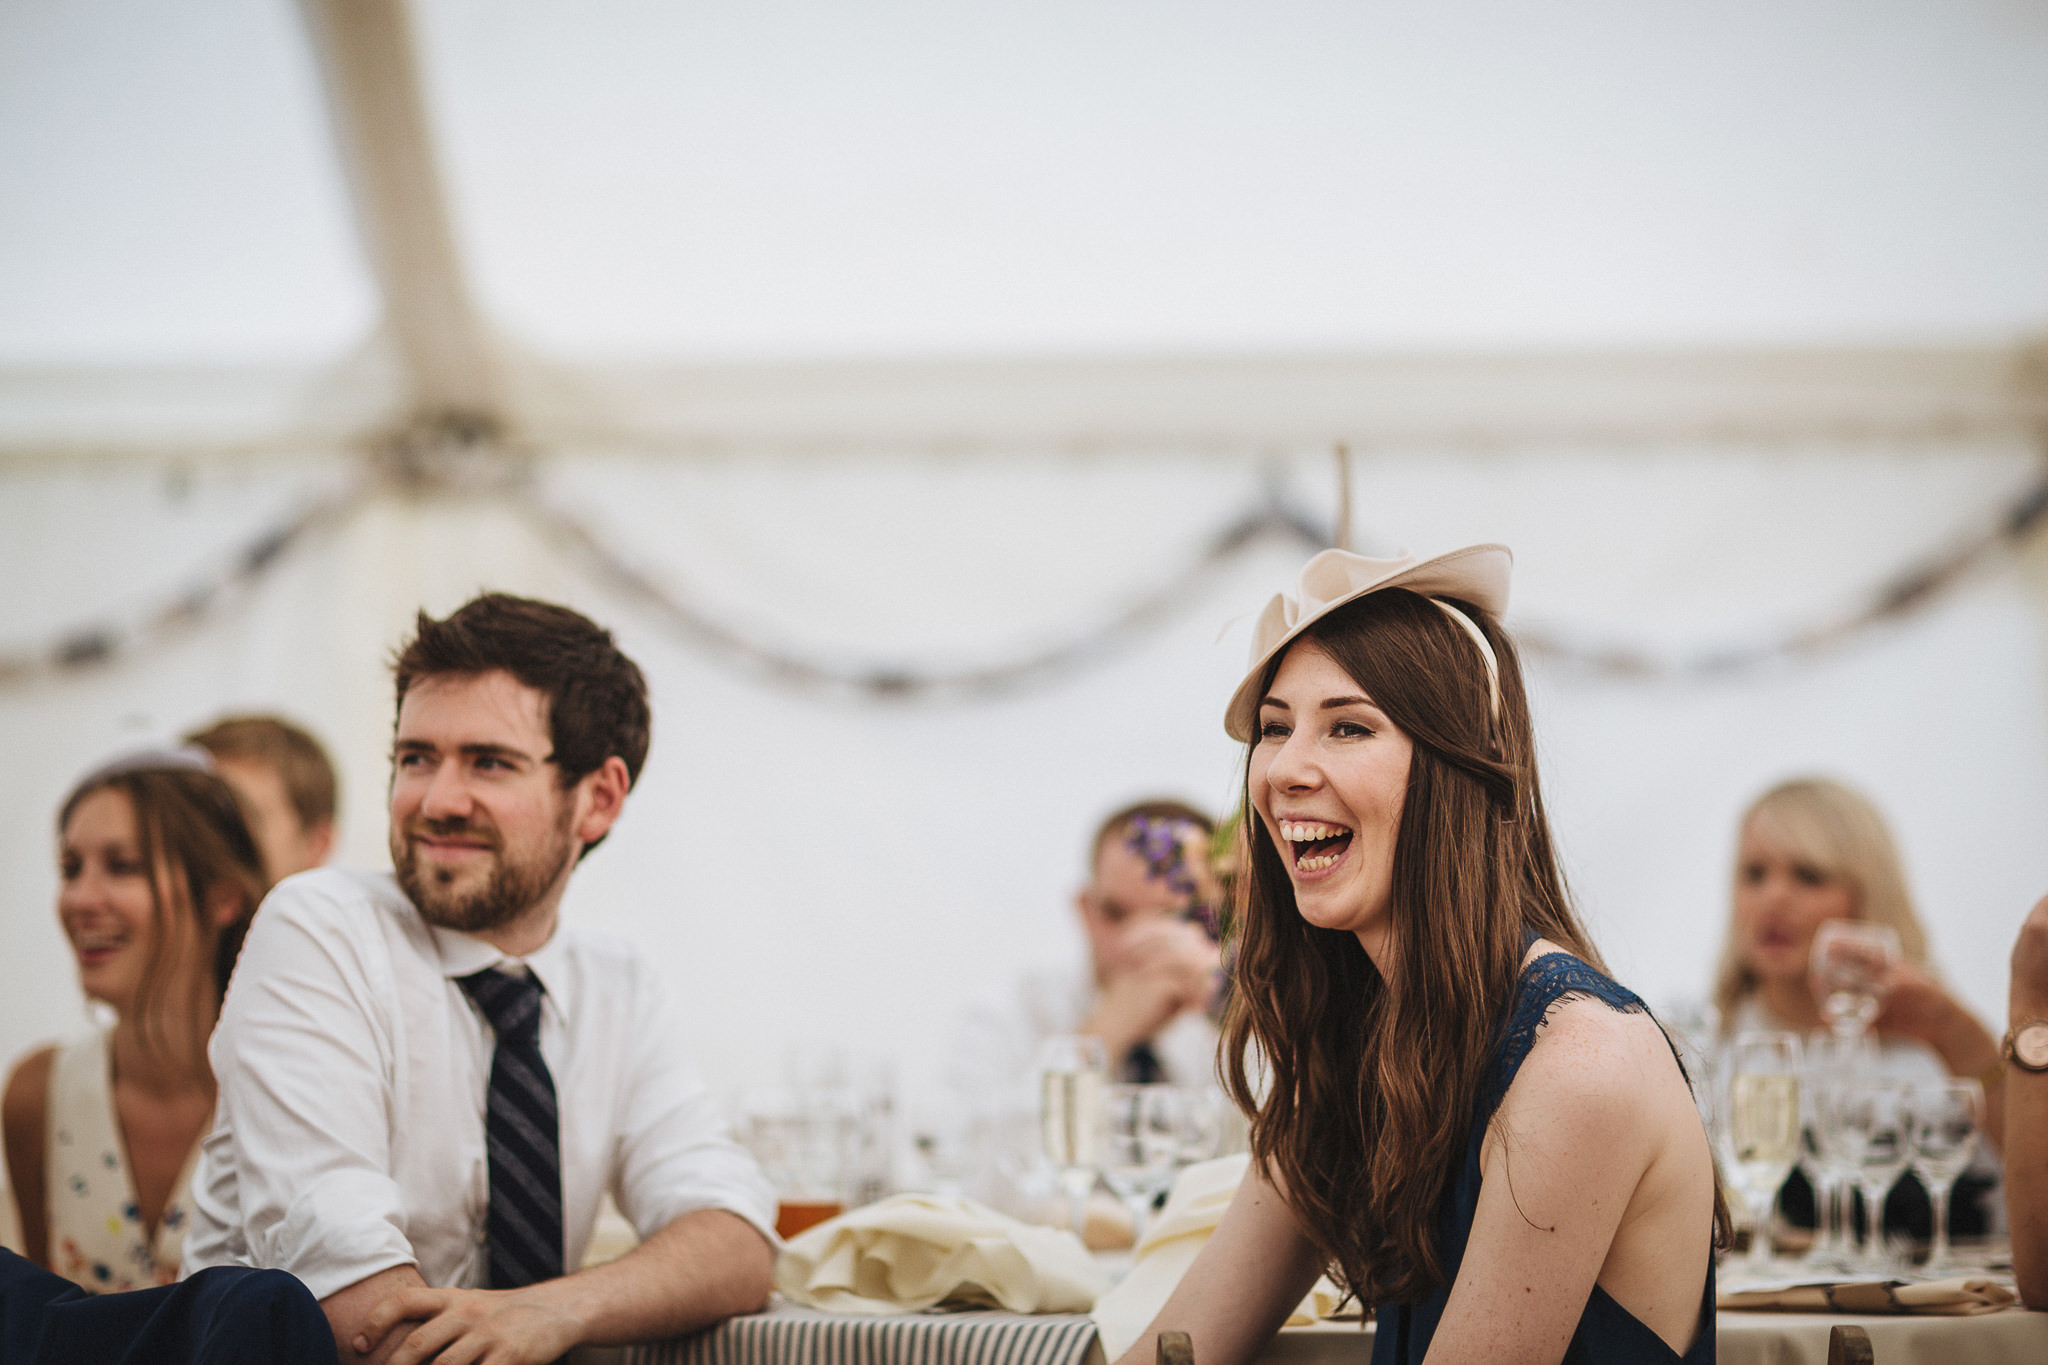 paul-marbrook-Farm-Wedding-Photographer-Lancashire-90058